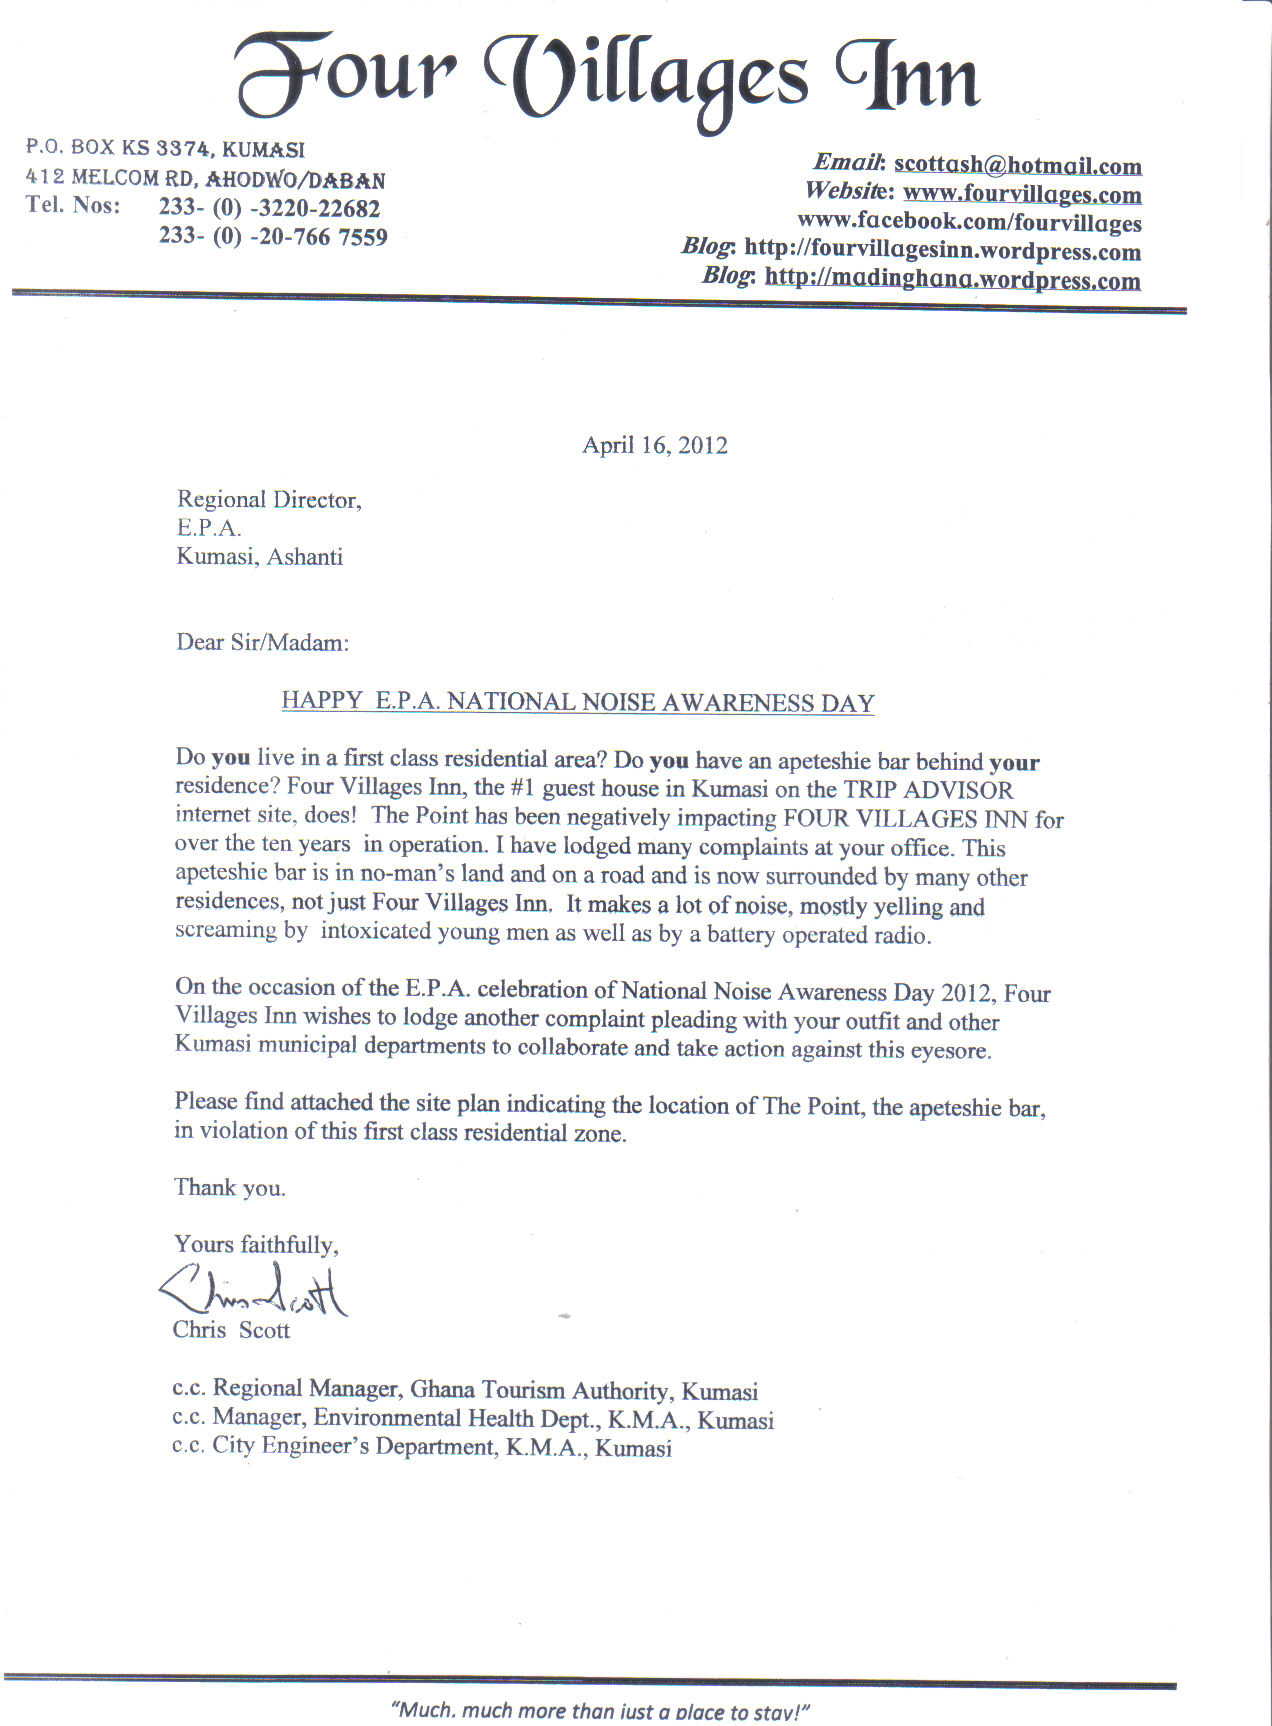 Formal noise complaint letter eczalinf formal noise complaint letter spiritdancerdesigns Gallery